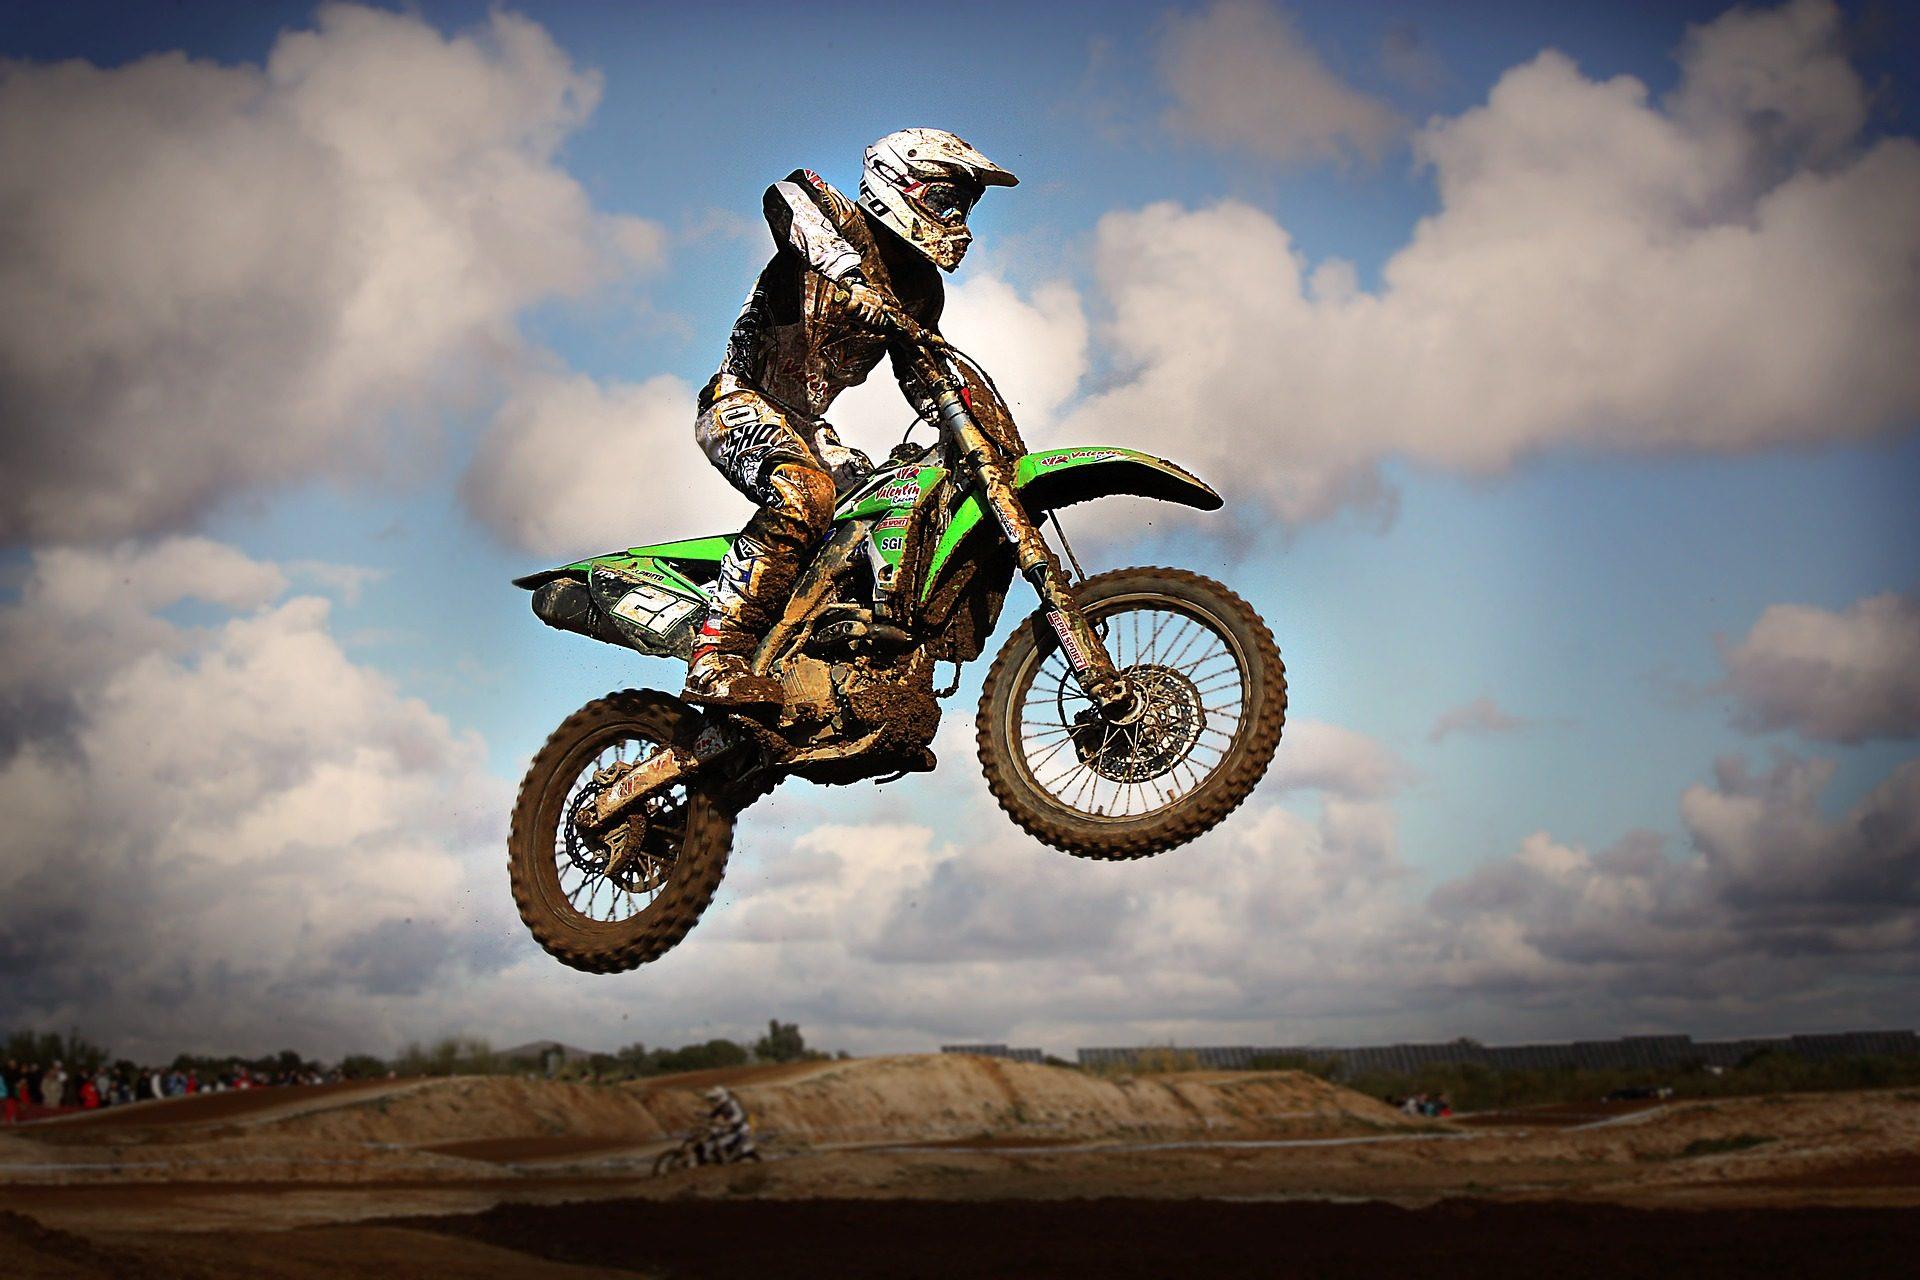 Moto, Μοτοκρός, άλμα, Πιρουέτα, ανταγωνισμού, λάσπη, κινδύνου - Wallpapers HD - Professor-falken.com